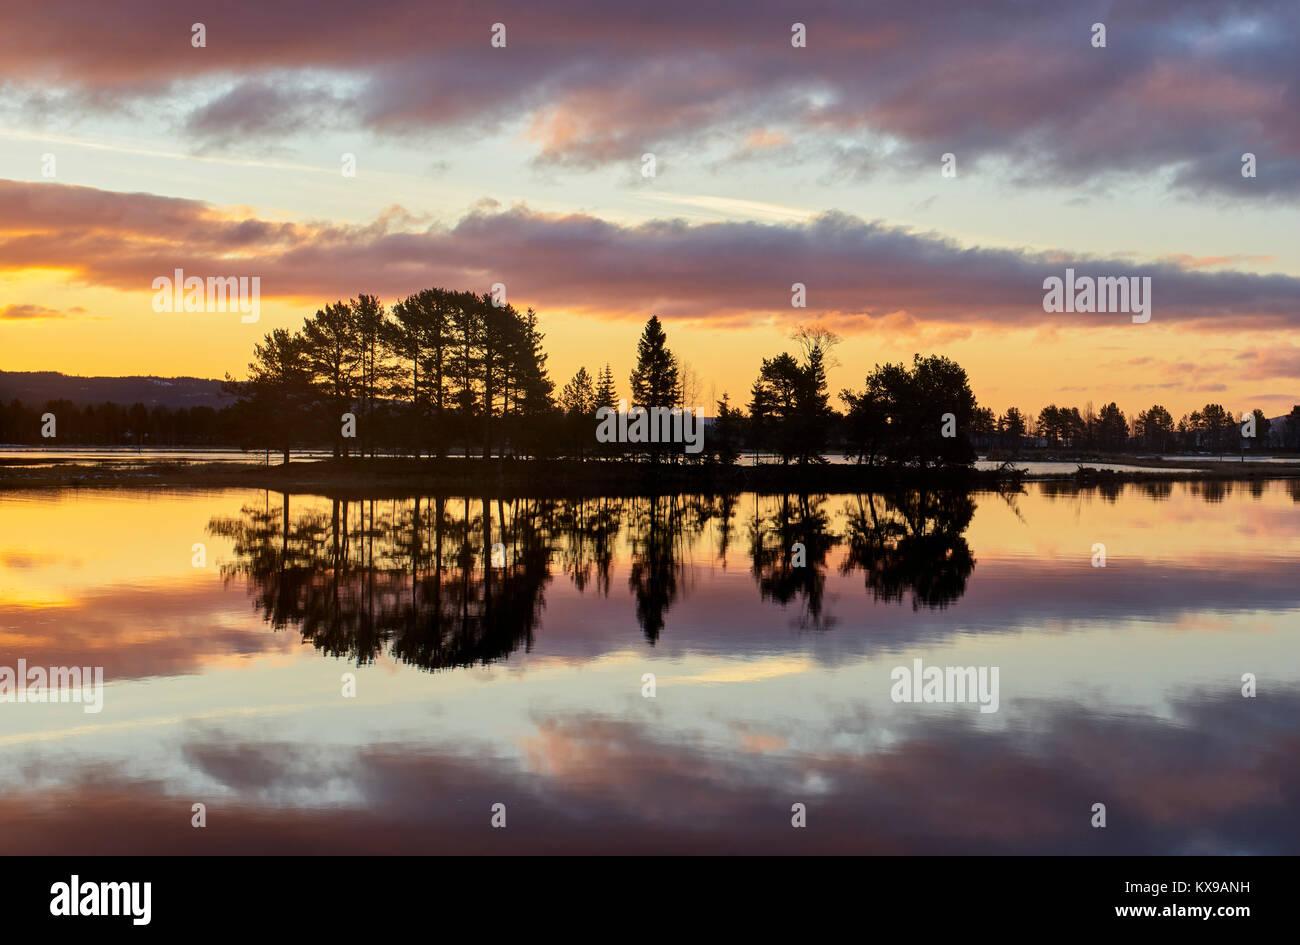 Amanecer sobre Osensjoen de Sandvik, Hedmark, Noruega. Imagen espejo reflejo Foto de stock